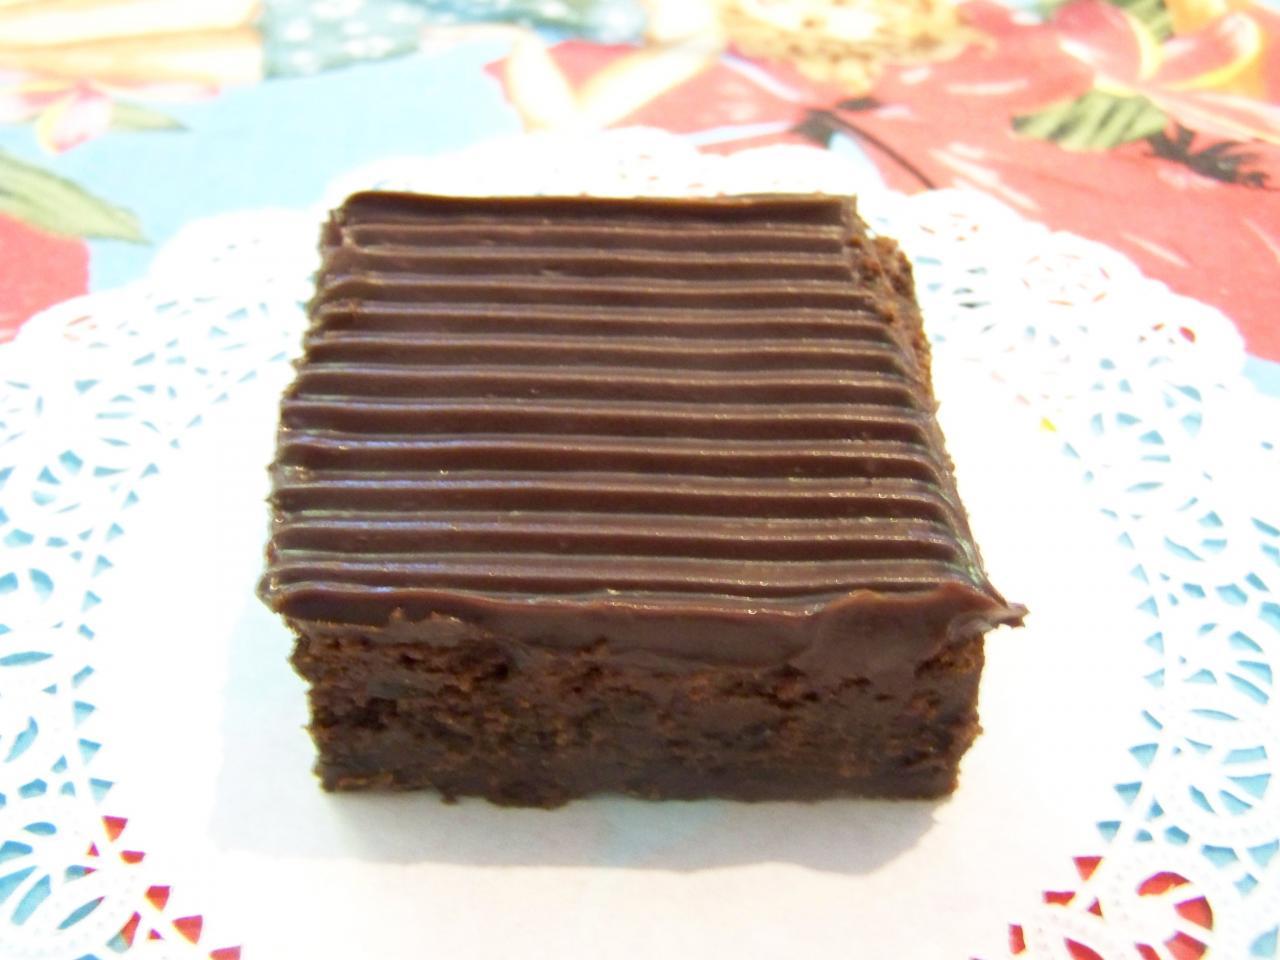 Chocolate fudge brownies loaded with mini chocolate chips with chocolate fudge icing.